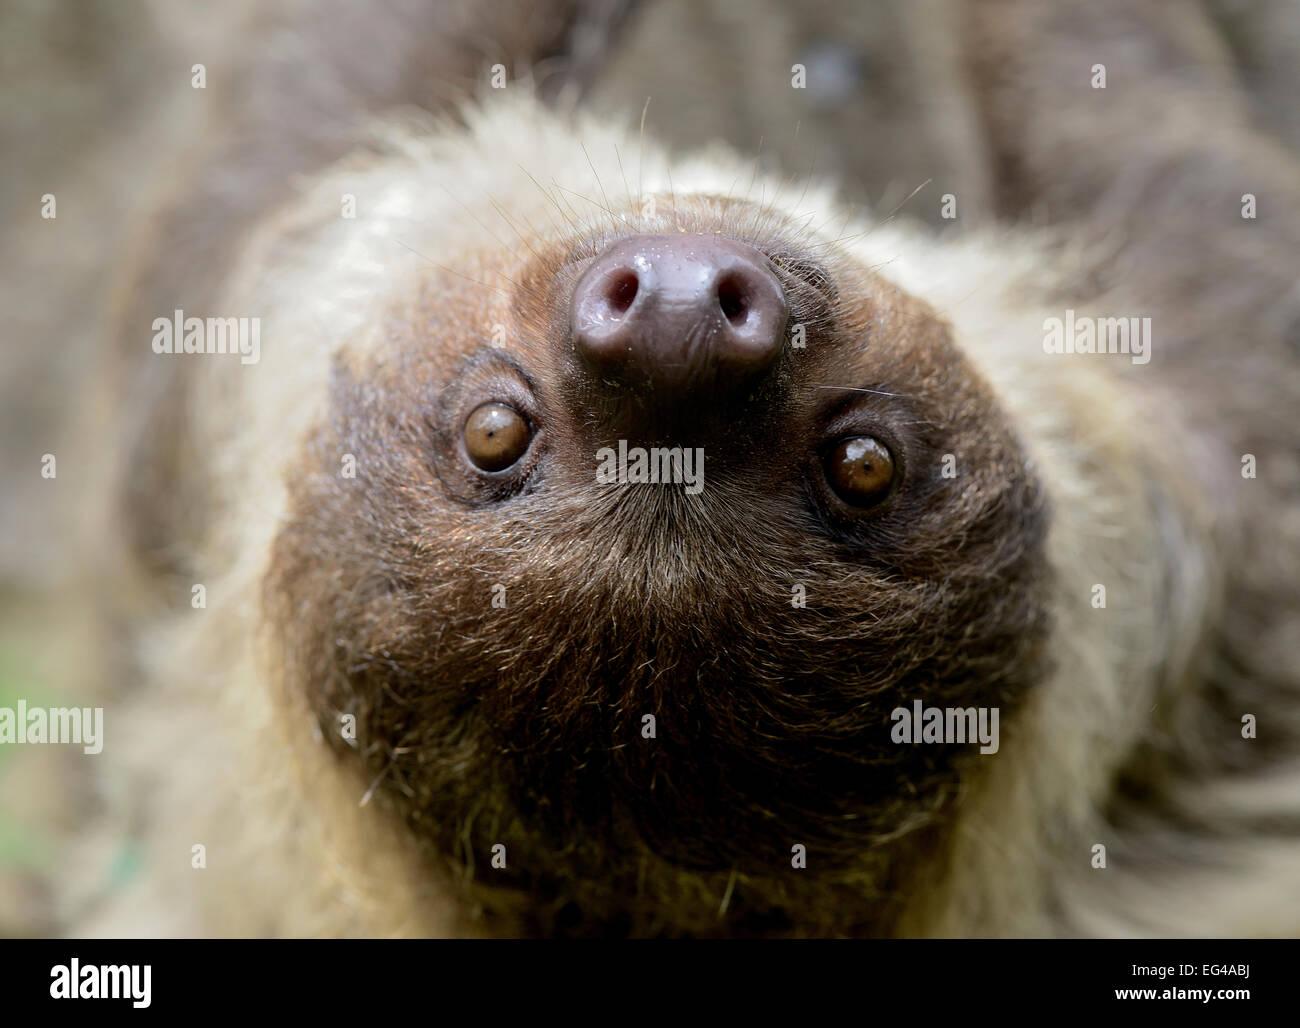 Unau / two-toed sloth (Choloepus didactylus) portrait French Guiana Stock Photo